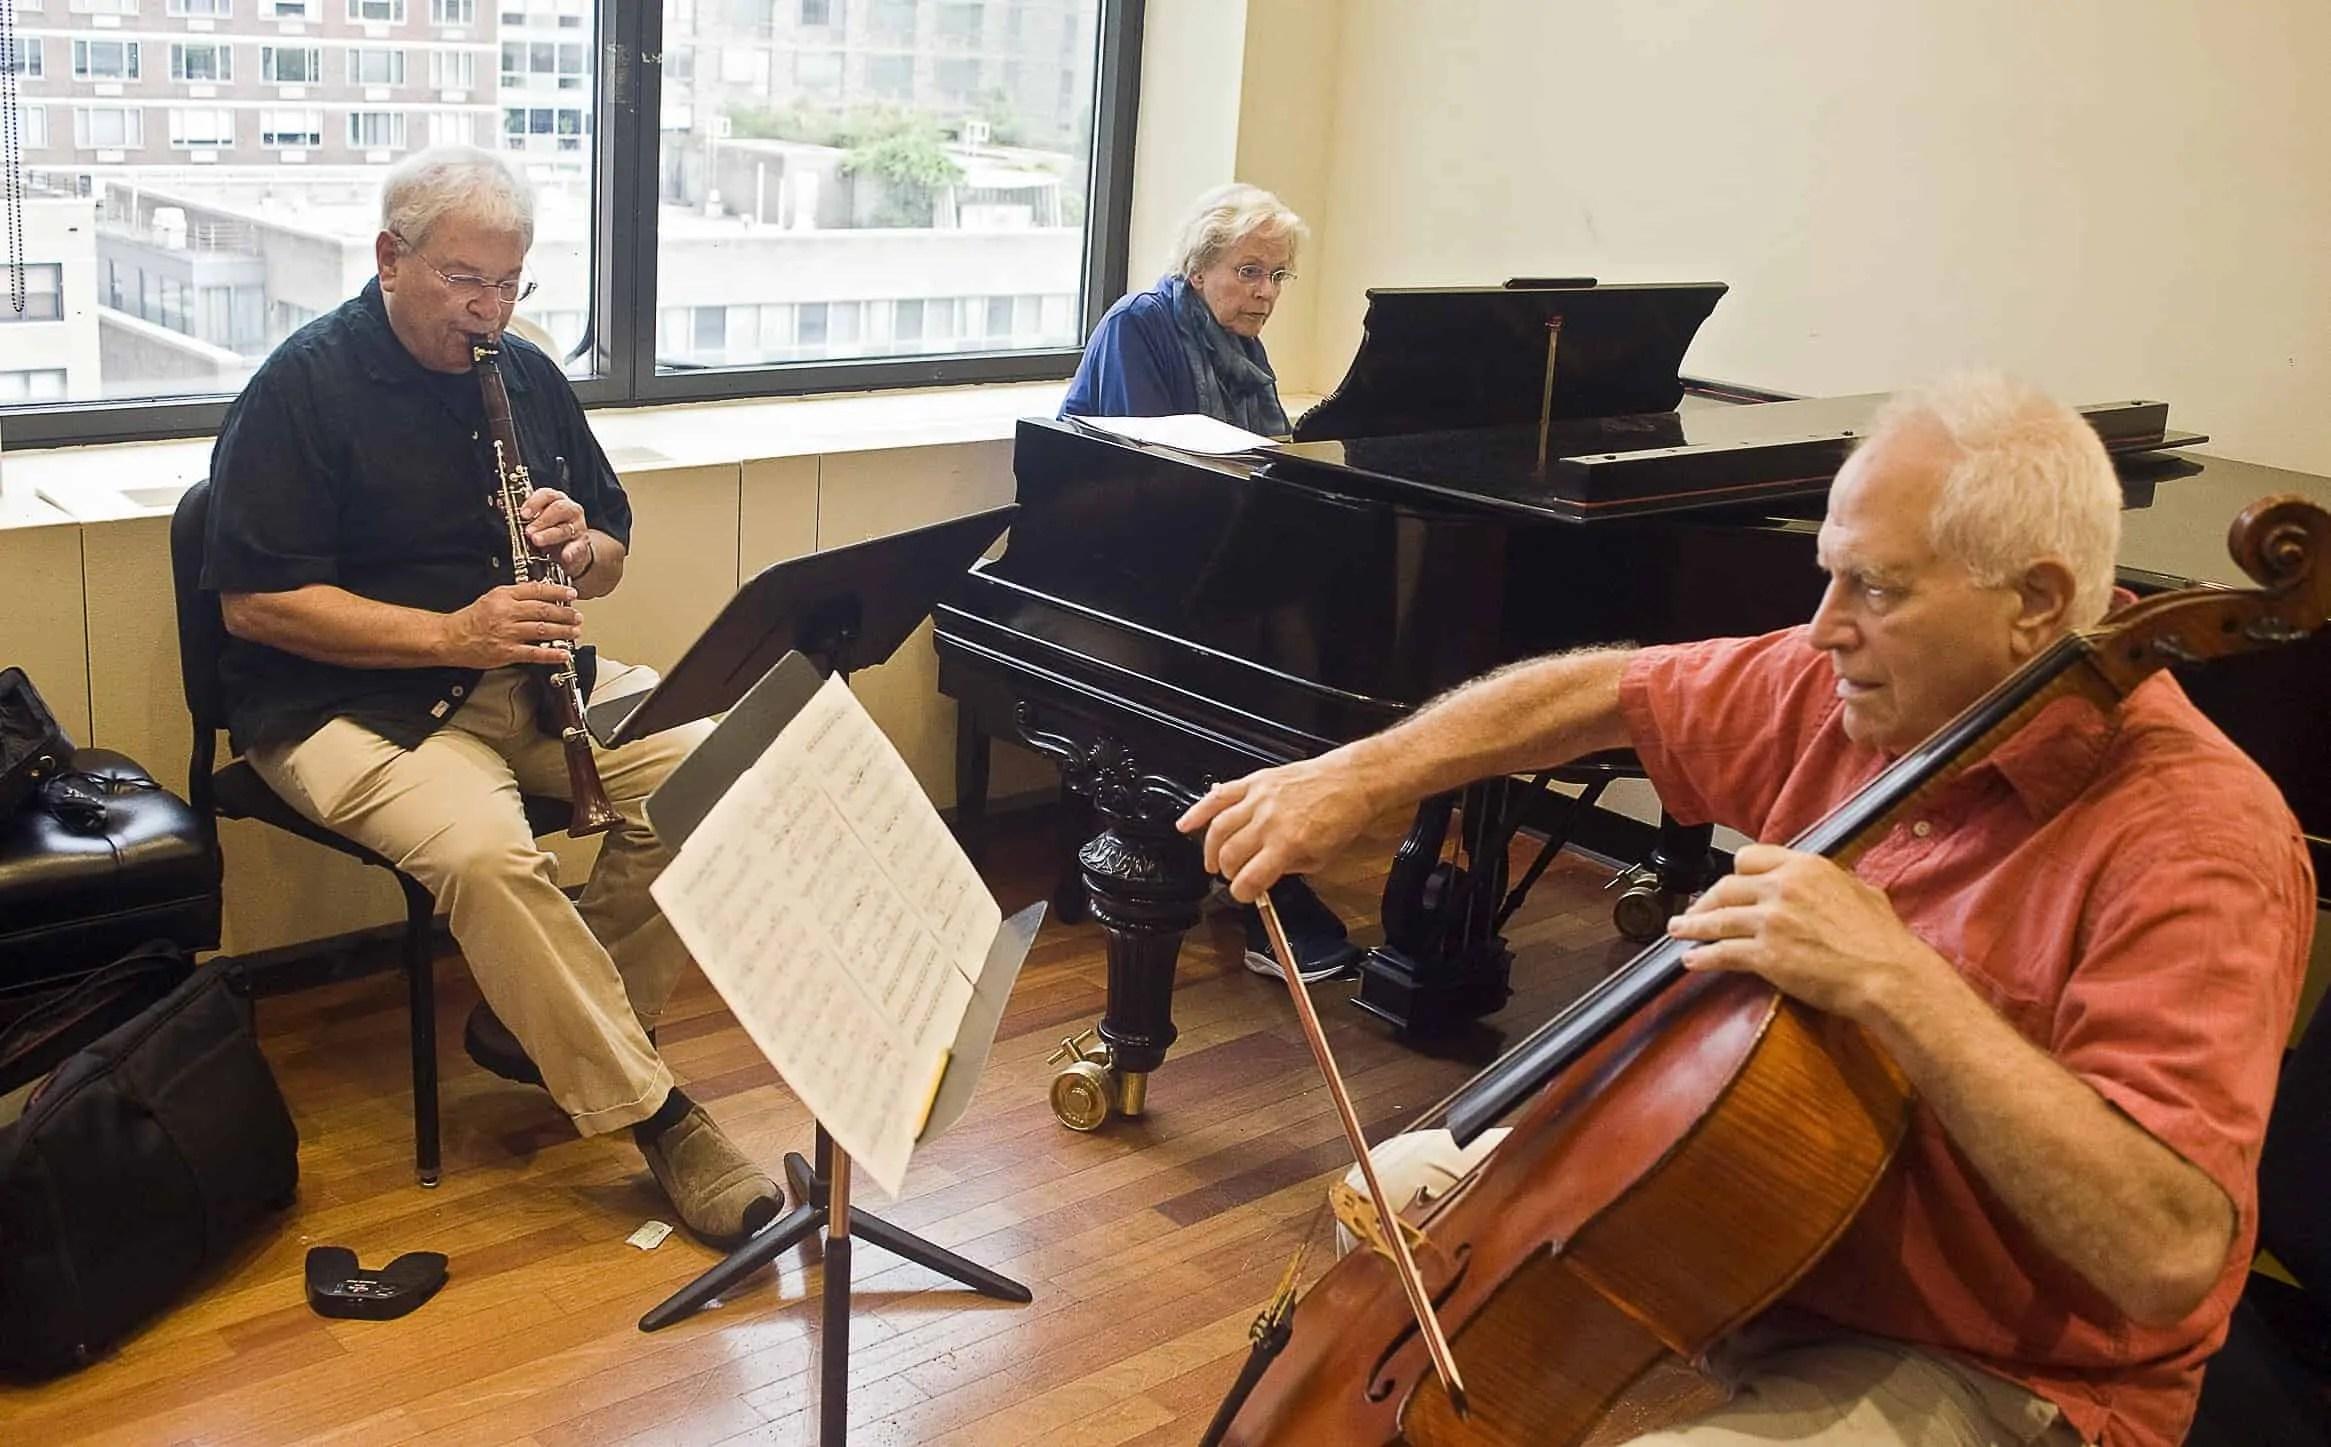 David Shifrin, Carol Rosenberger, and Fred Sherry